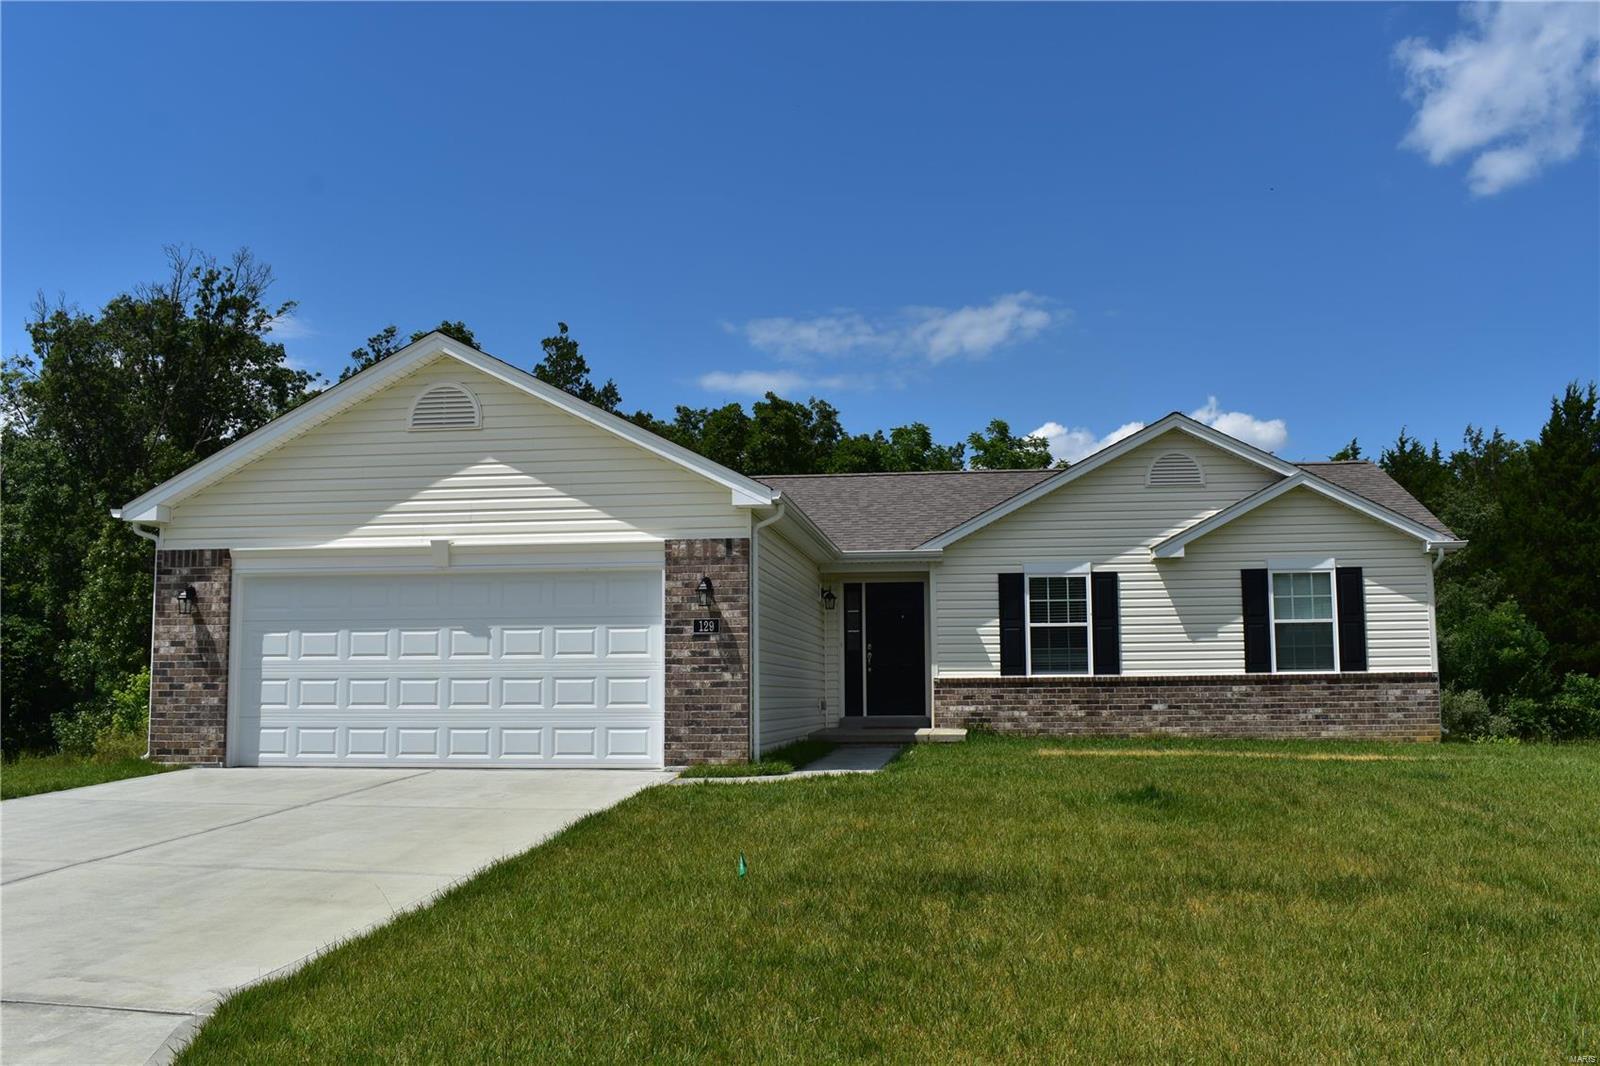 145 TBB-Lot 23 Bryan Ridge Property Photo - Wright City, MO real estate listing